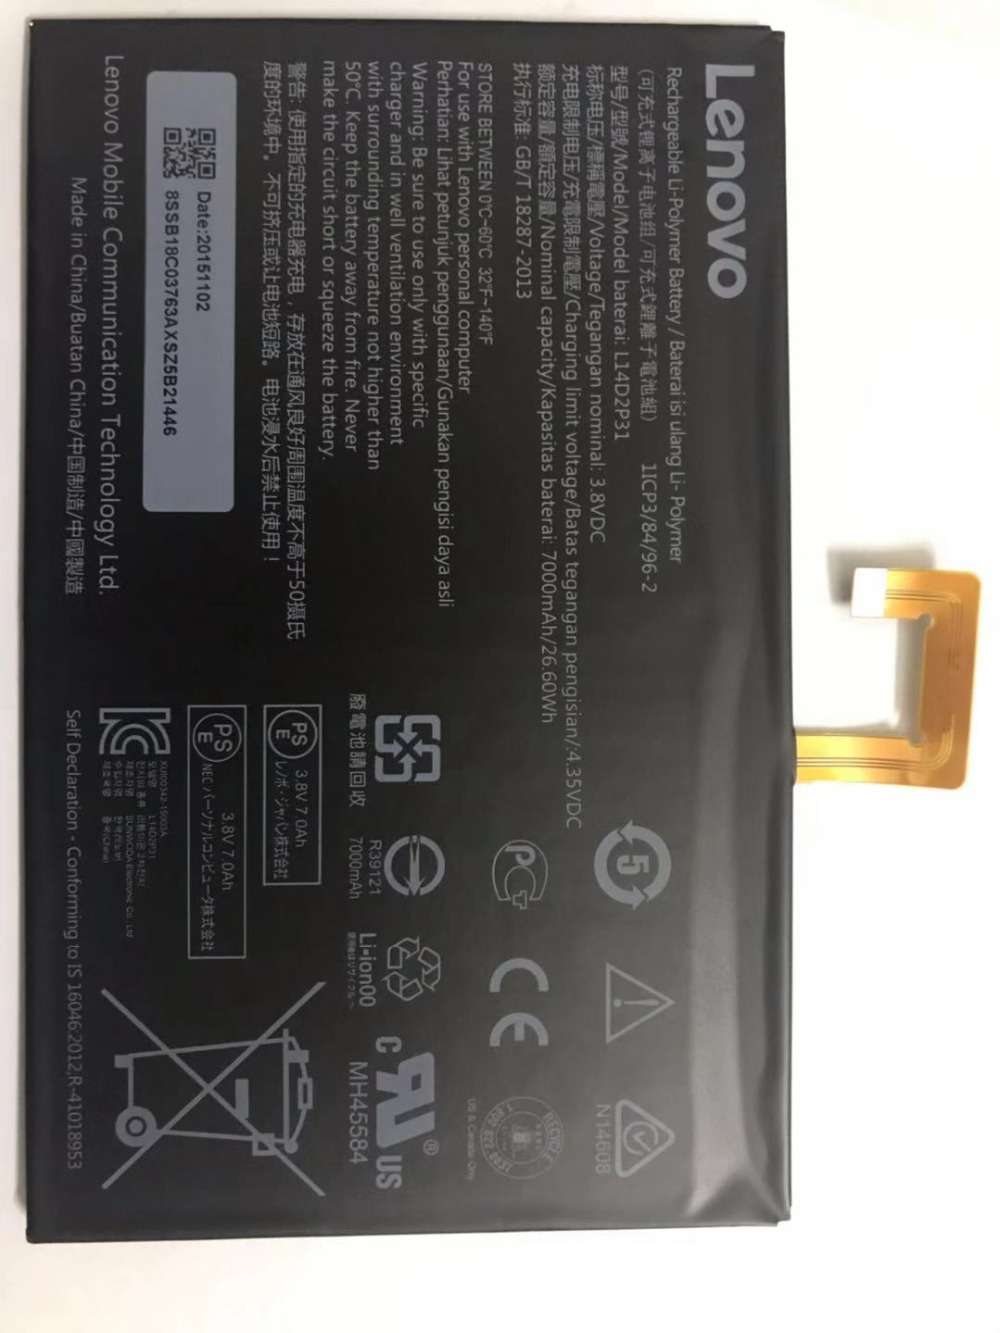 New original L14D2P31 7000mAh Battery For Lenovo Tab 2 TAB2 A10-70F A10-70L A10-70LC TB2 X30L TB2-X30F TB2-X30M New original L14D2P31 7000mAh Battery For Lenovo Tab 2 TAB2 A10-70F A10-70L A10-70LC TB2 X30L TB2-X30F TB2-X30M